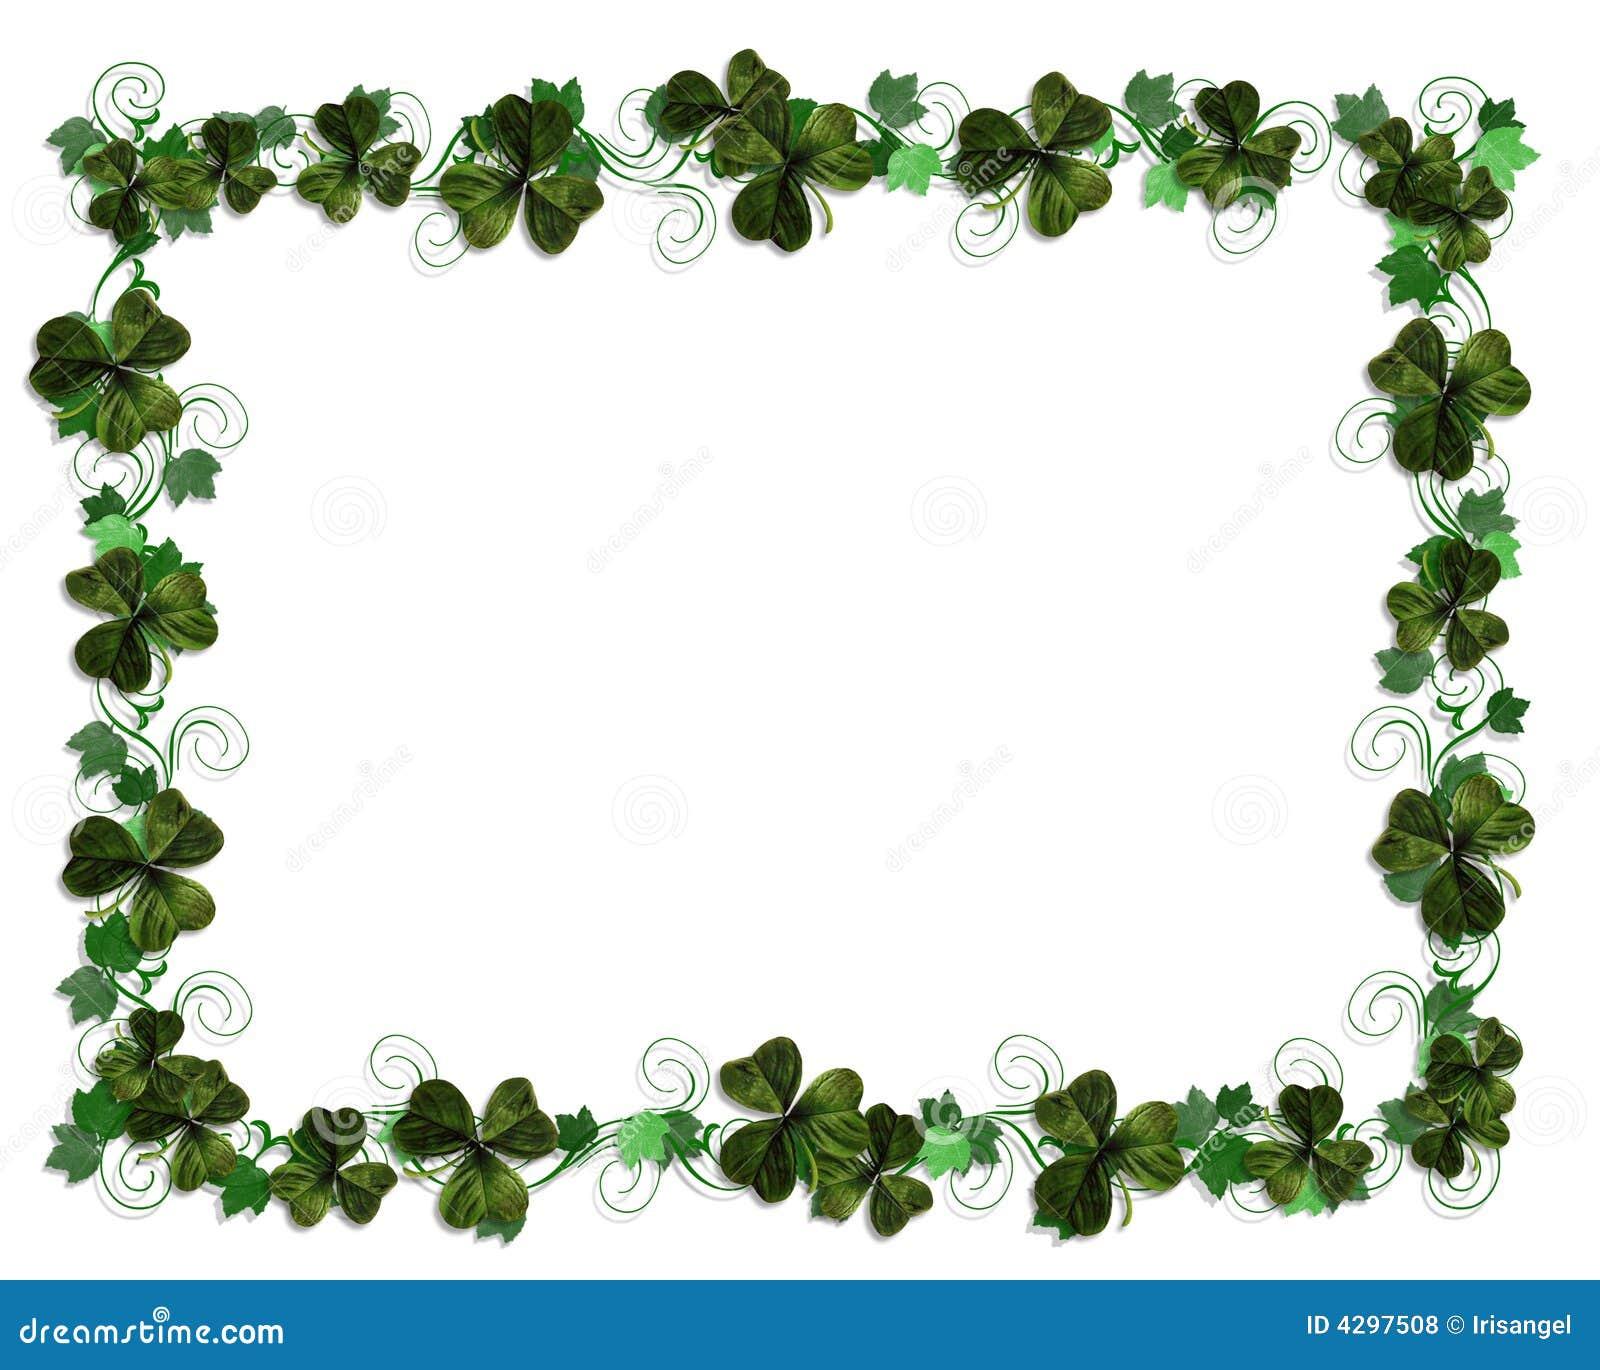 Irish border Ivy and Shamrocks